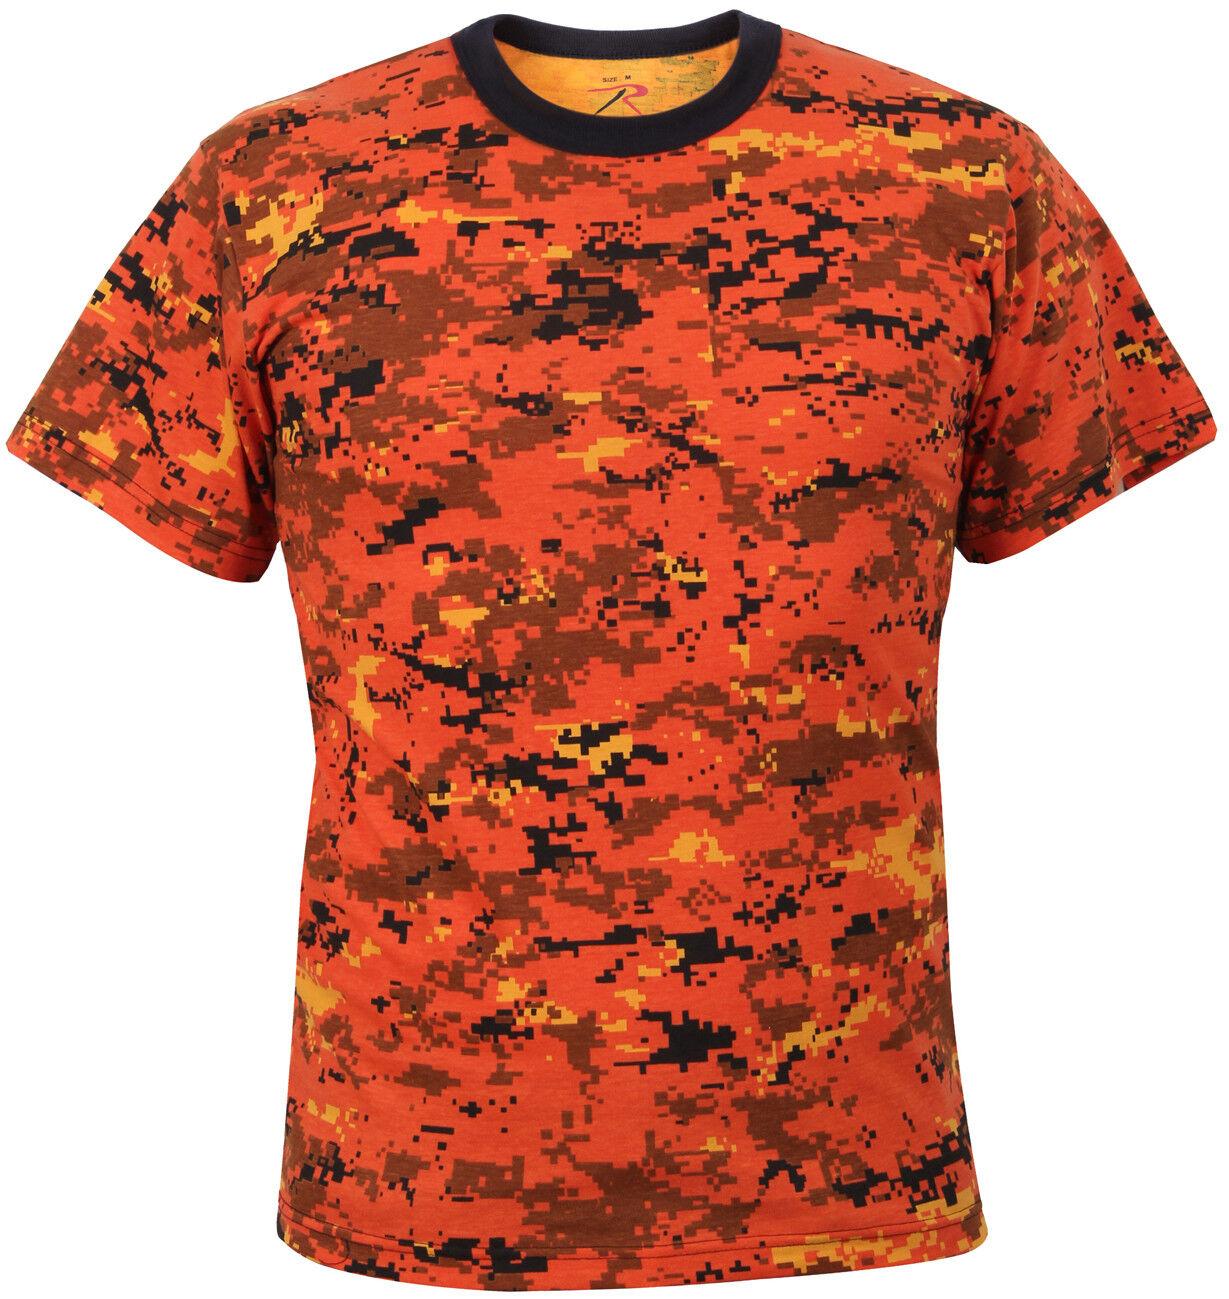 Camo t-shirt orange digital camouflage various sizes redhco 5735